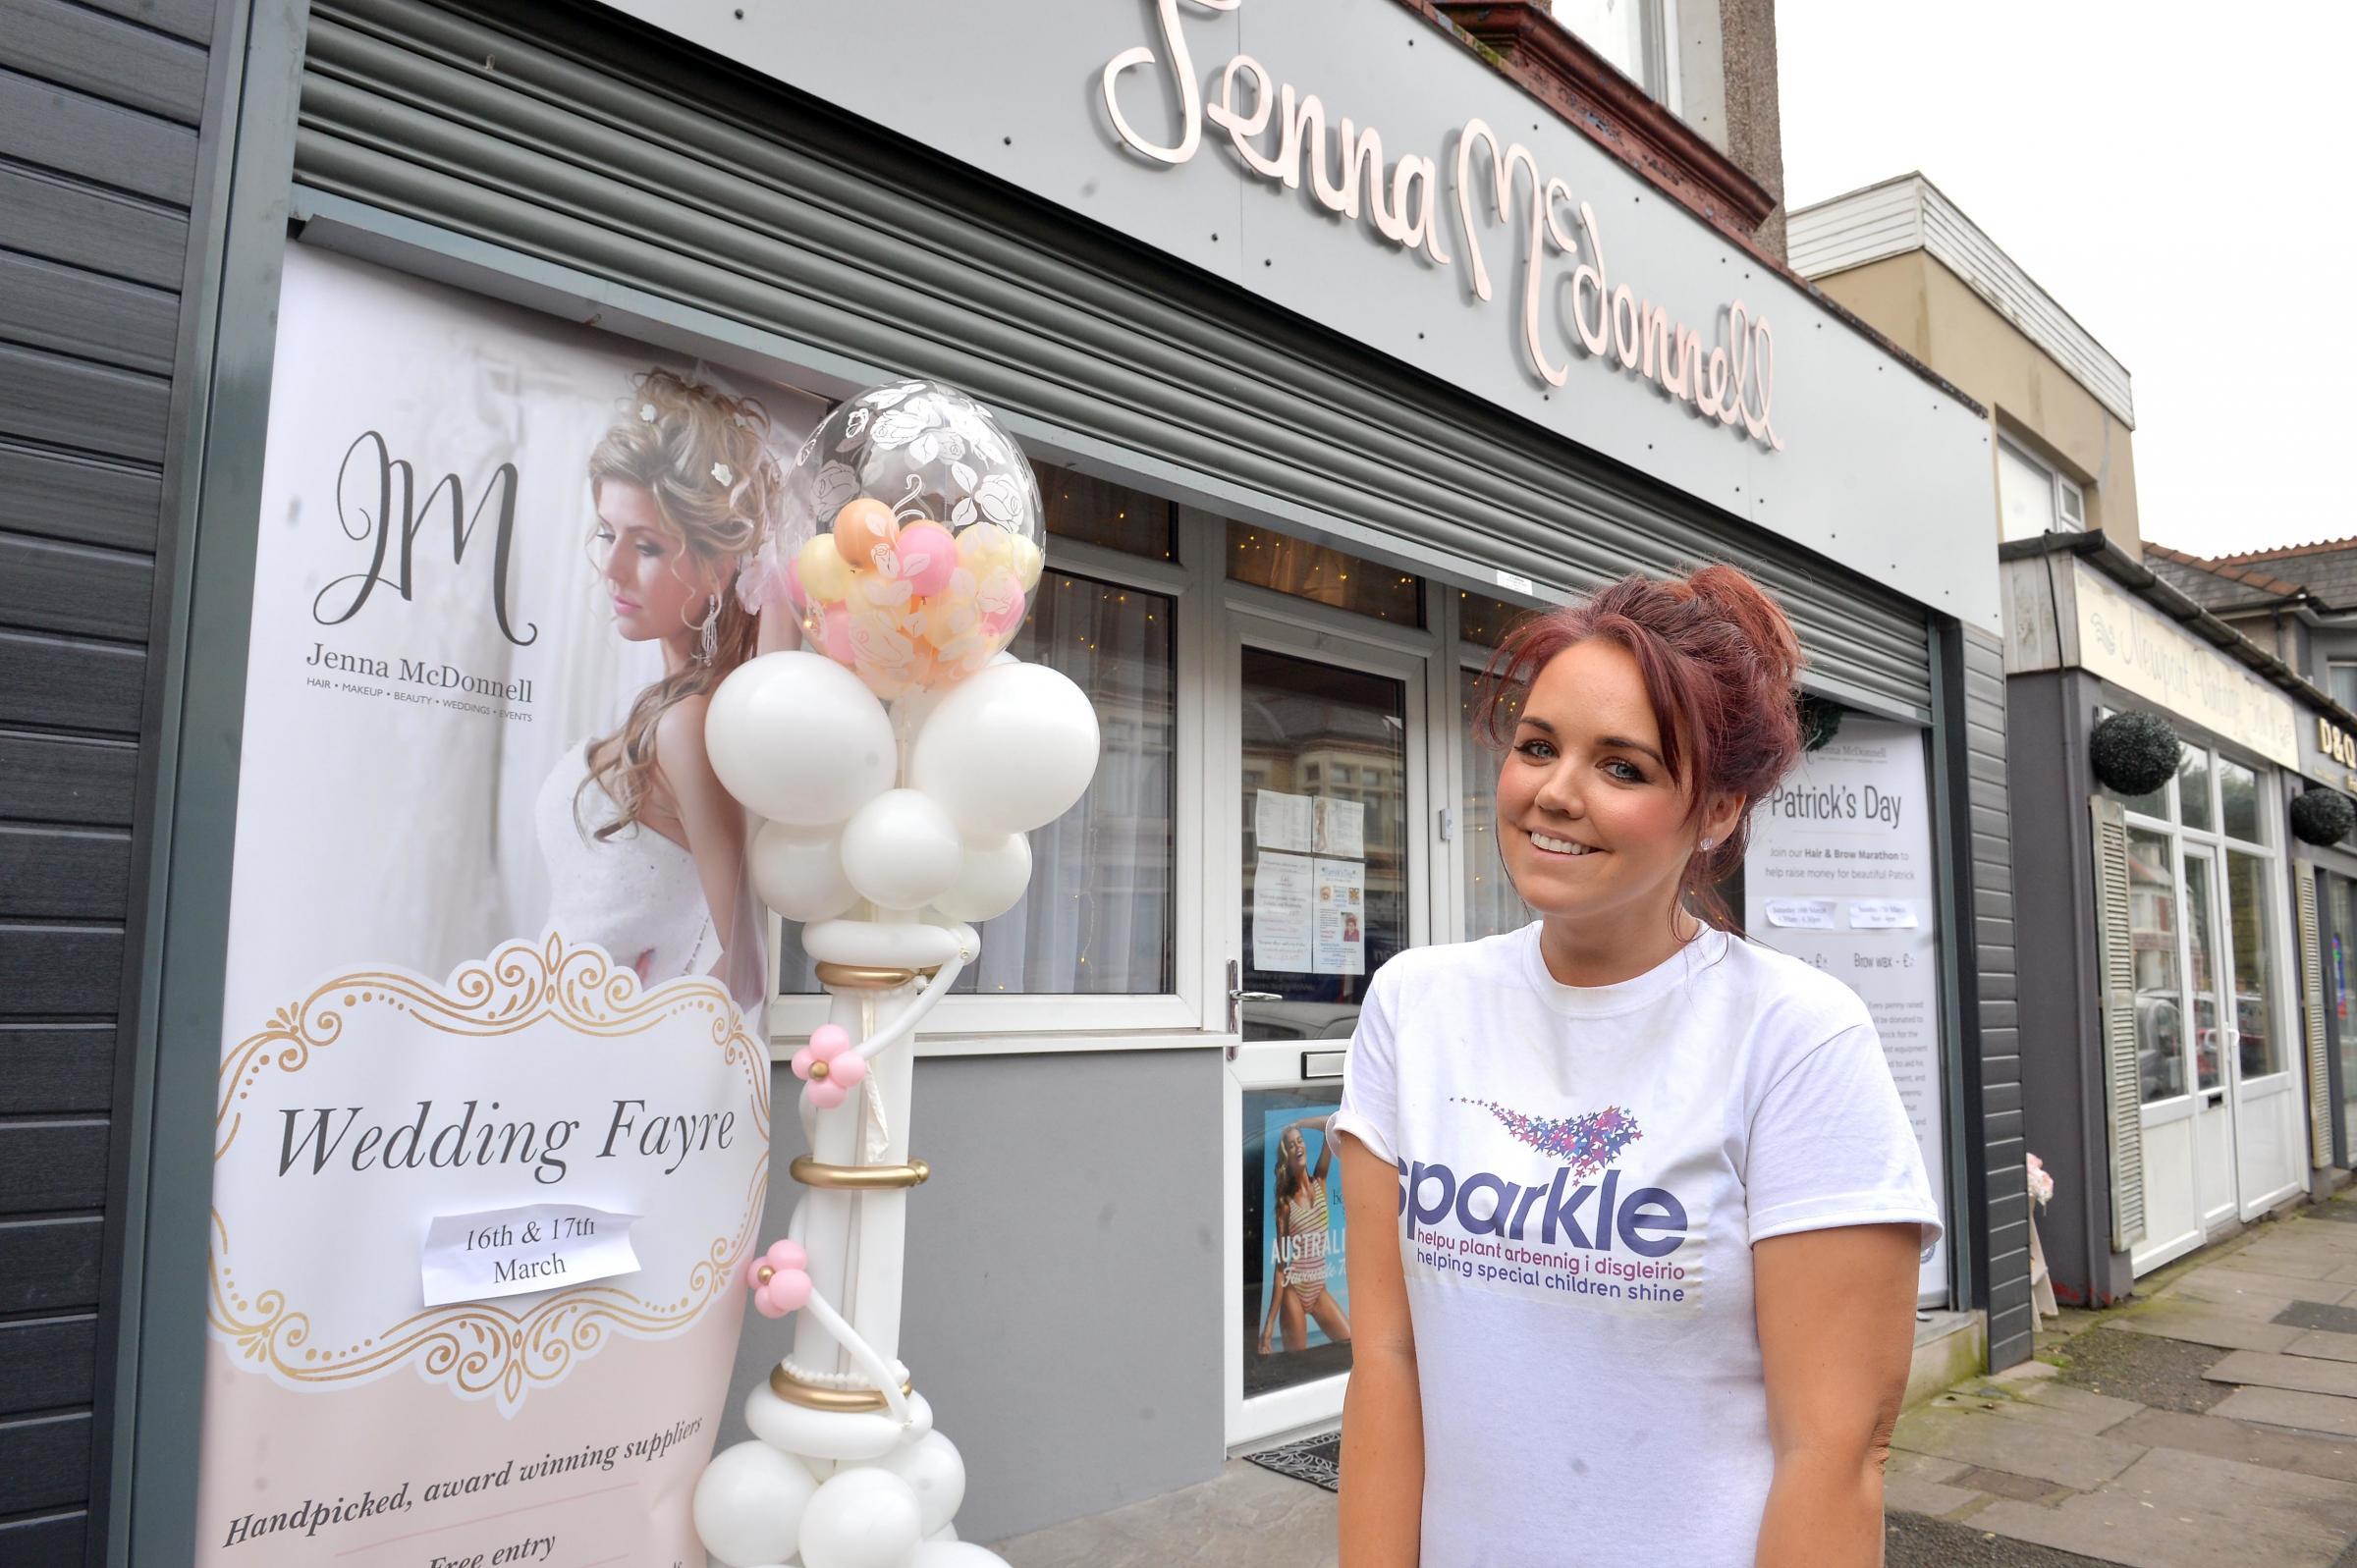 Jenna McDonnell's hair marathon raises thousands for Patrick Pullen and the Sparkle Appeal